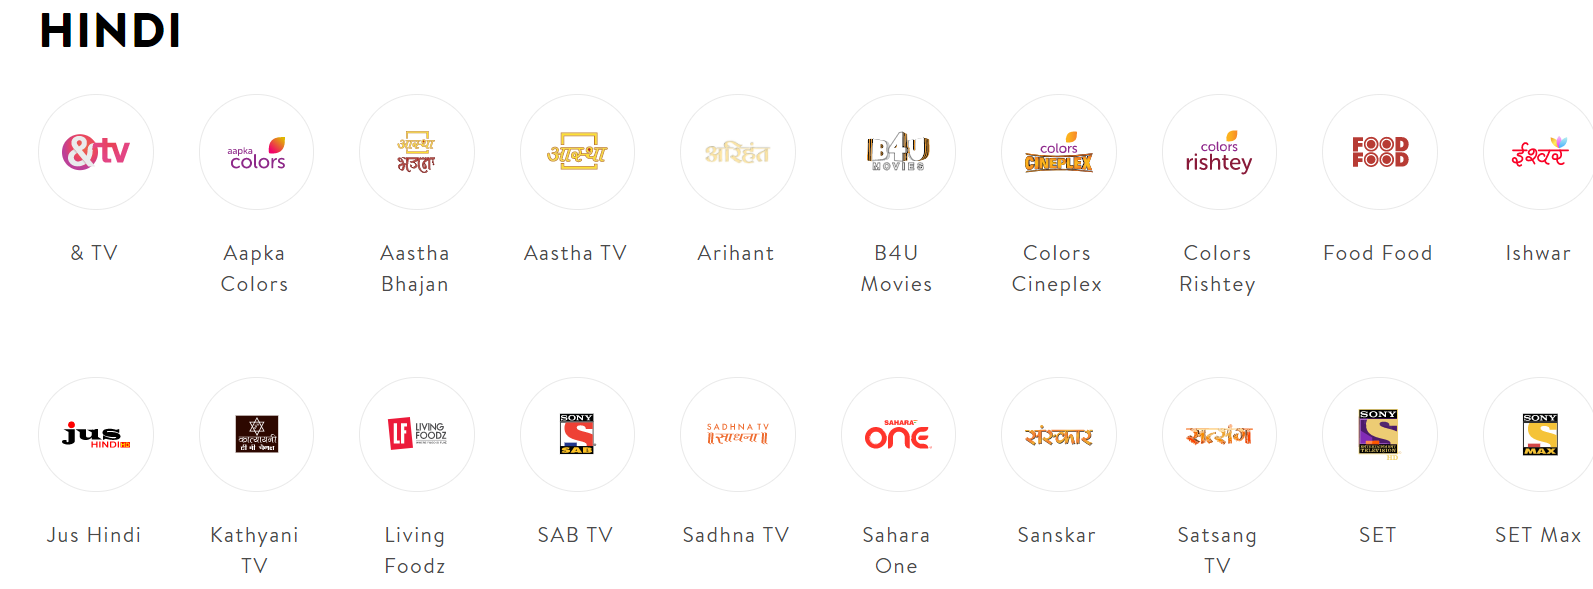 Sling TV Hindi International Channels